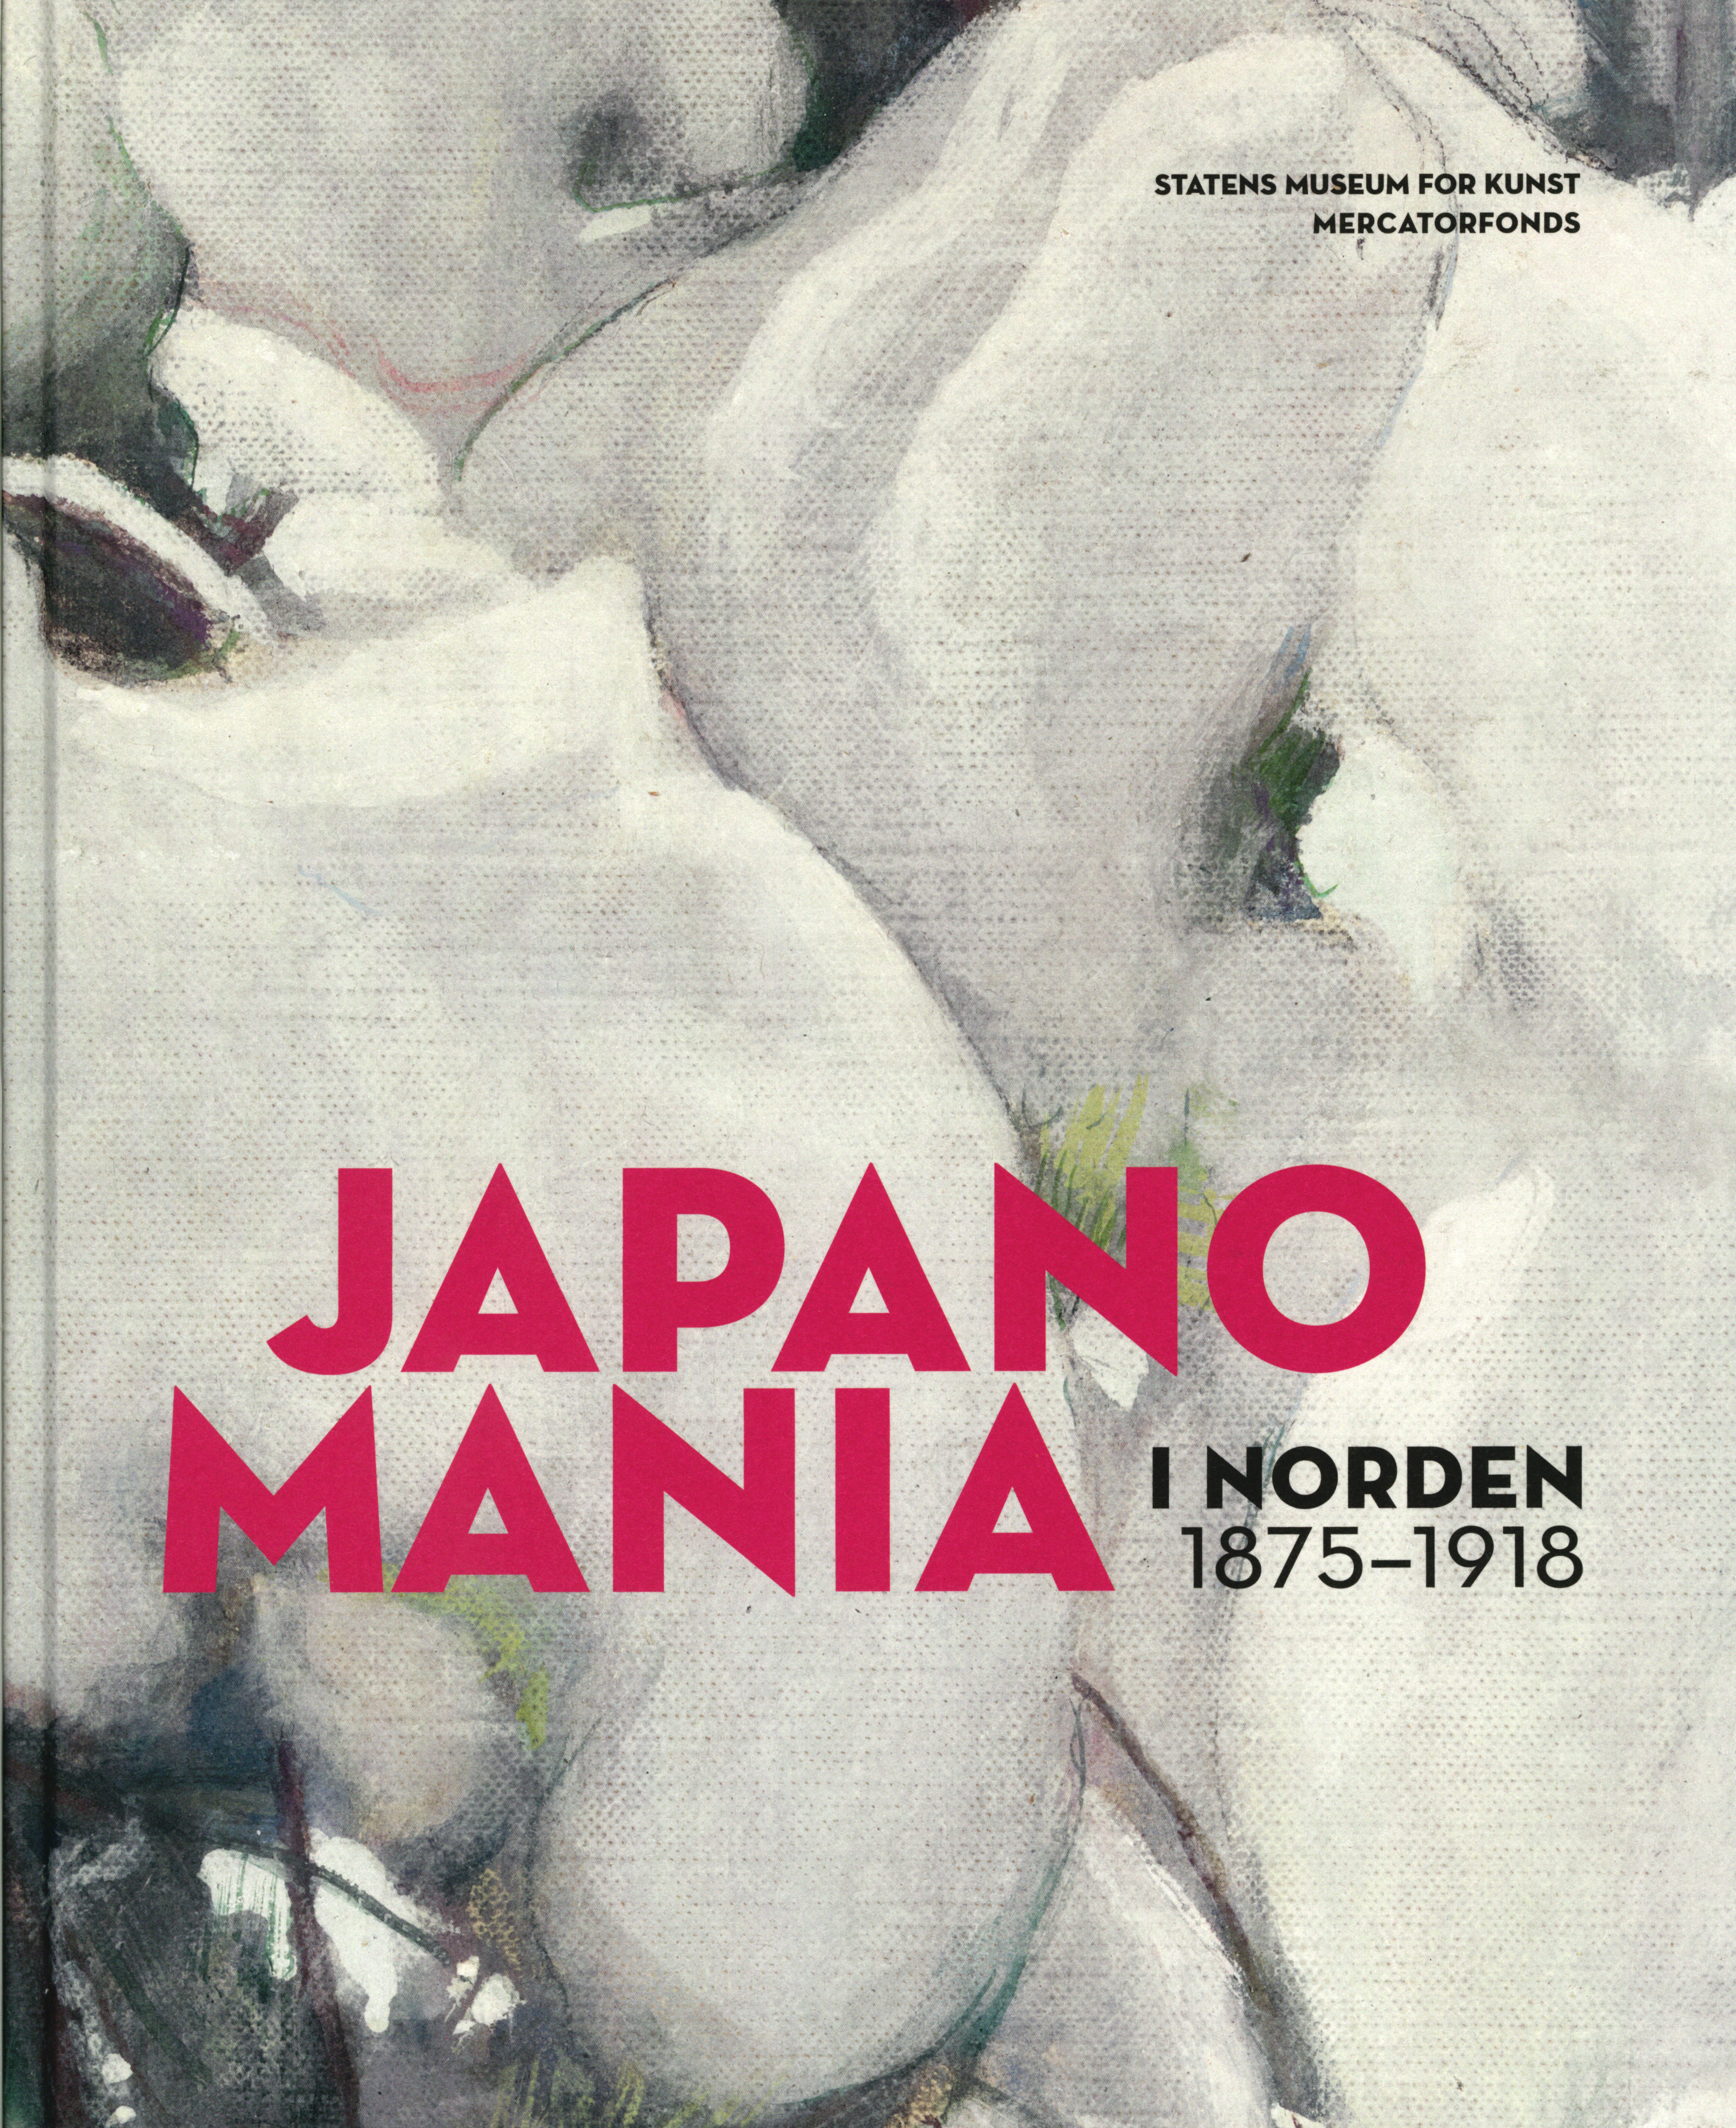 Japanomania i Norden 1875-1918